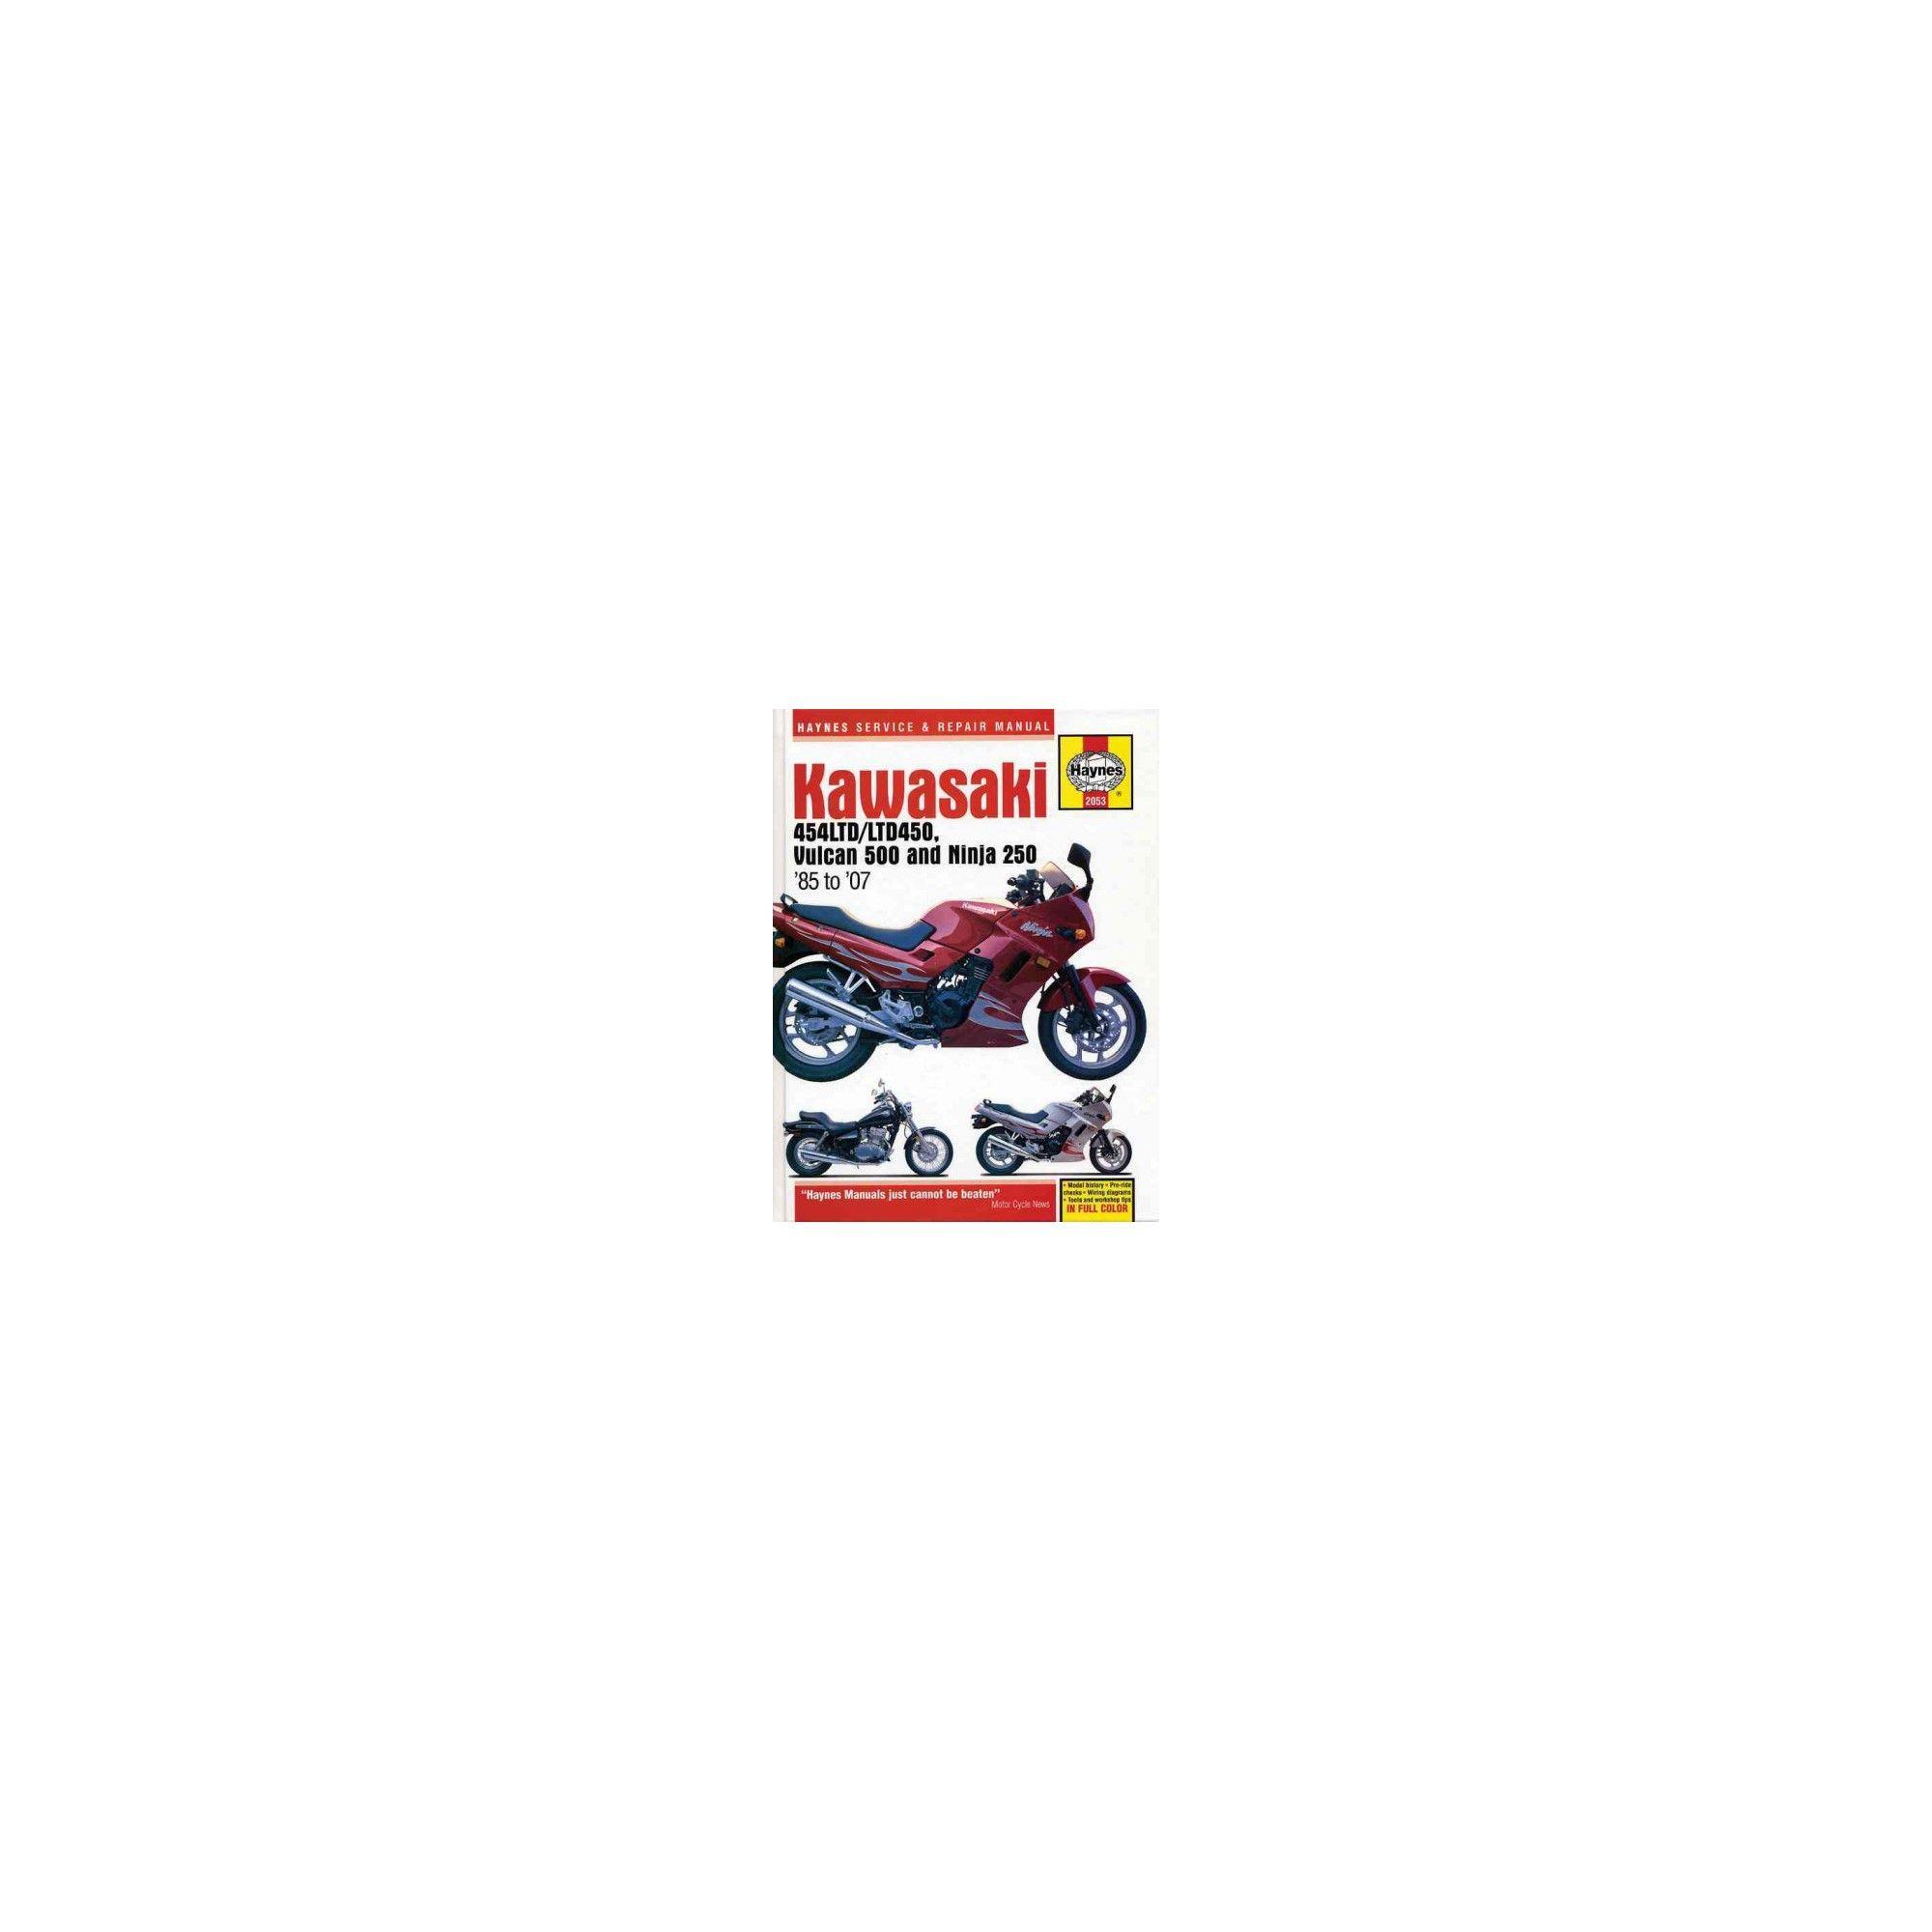 Haynes Kawasaki 454LTD/LTD450, Vulcan 500 Ninja 250 85 to 07 Service Repair  Manual (Paperback) (Alan